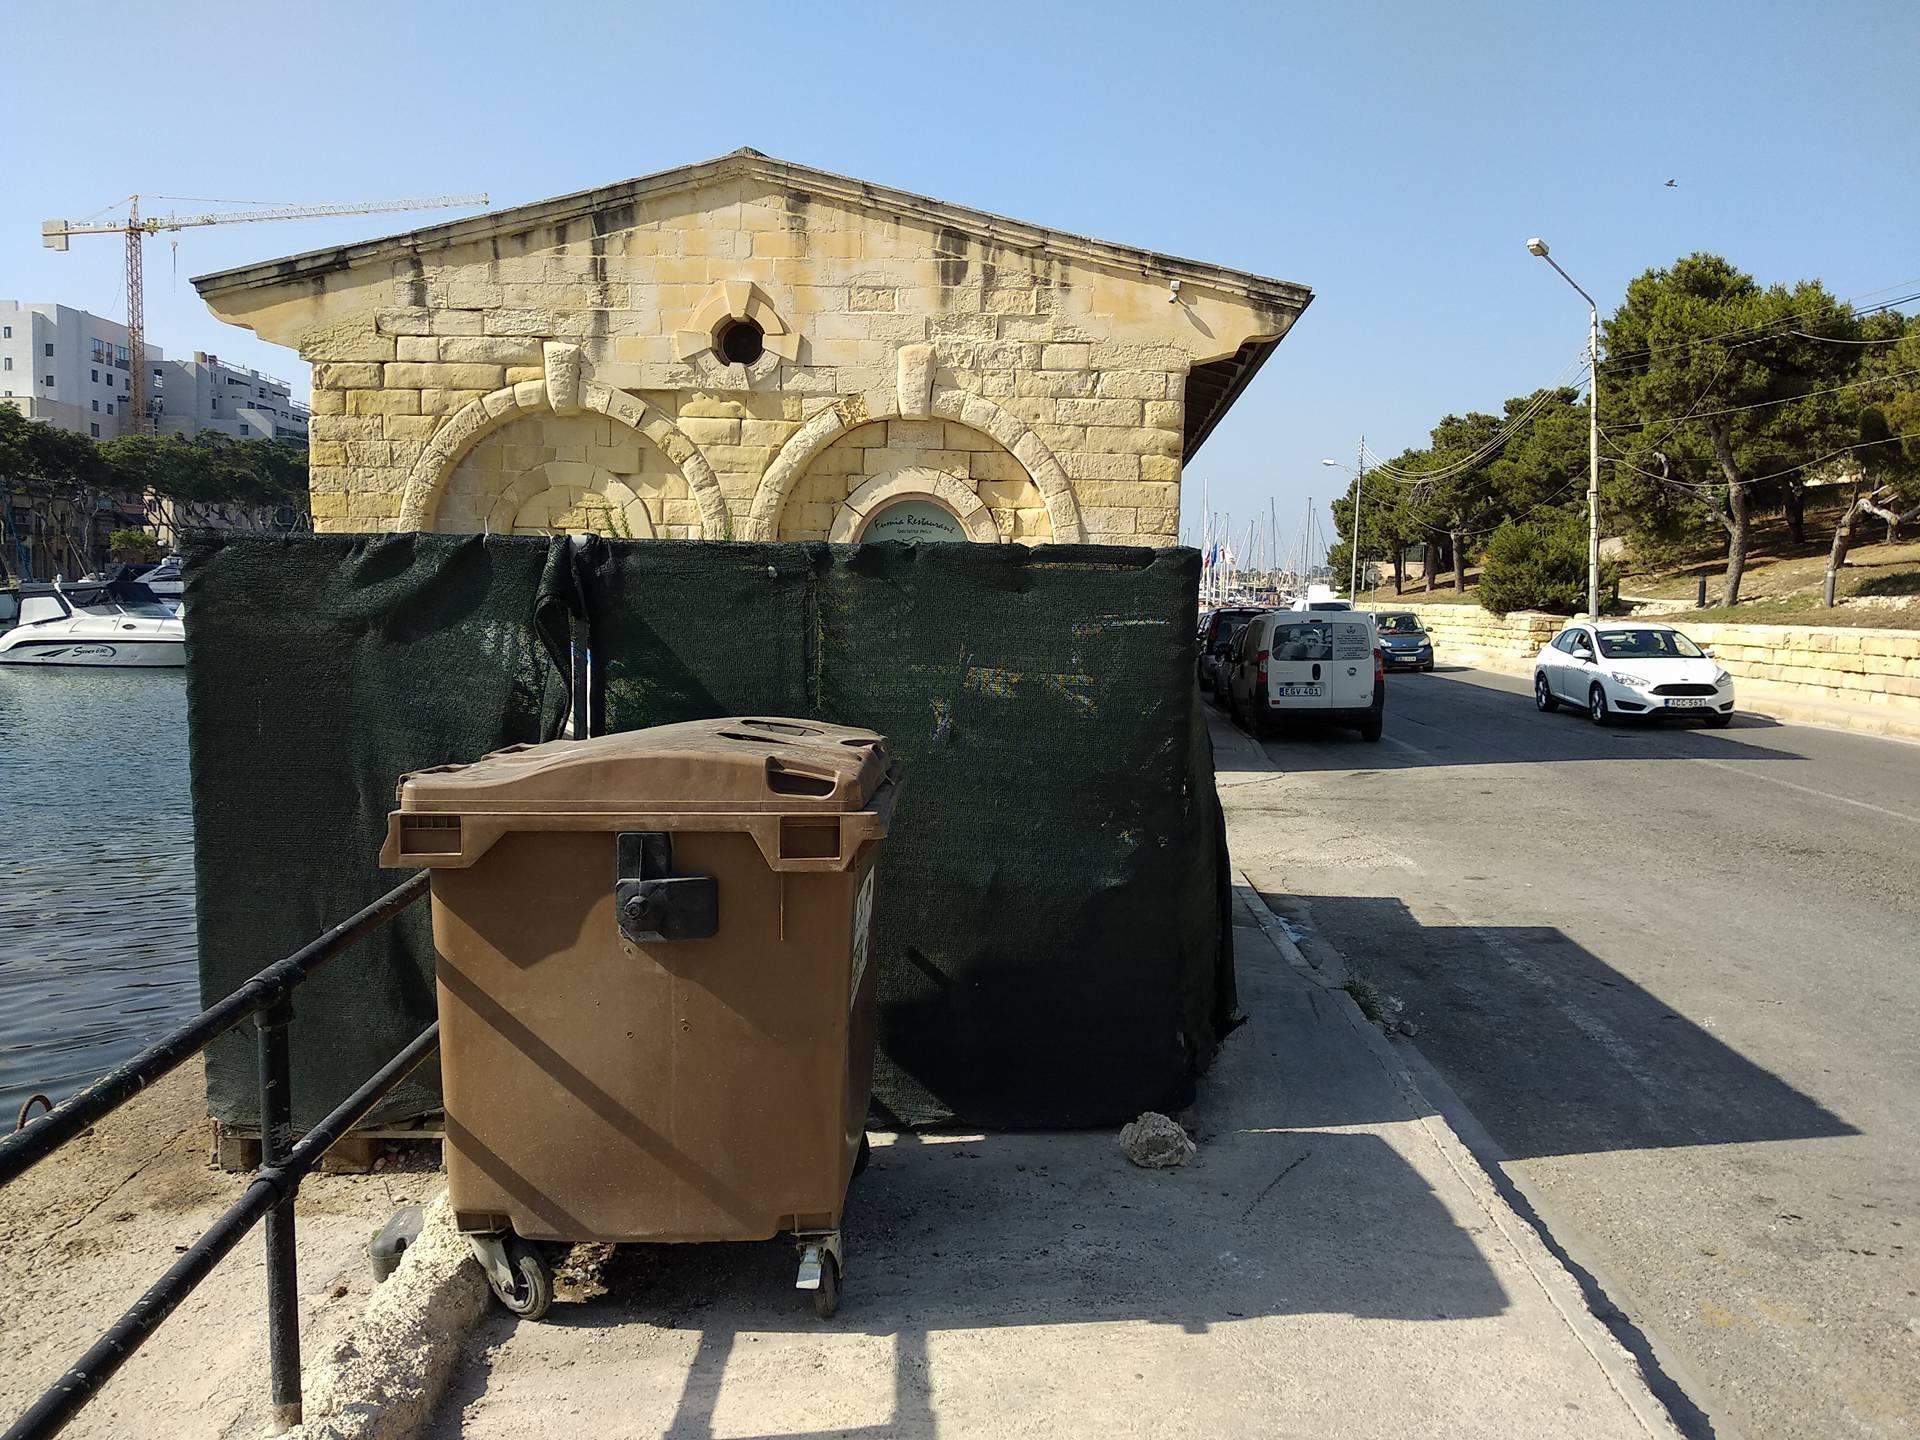 Sa Maison pavement access is blocked